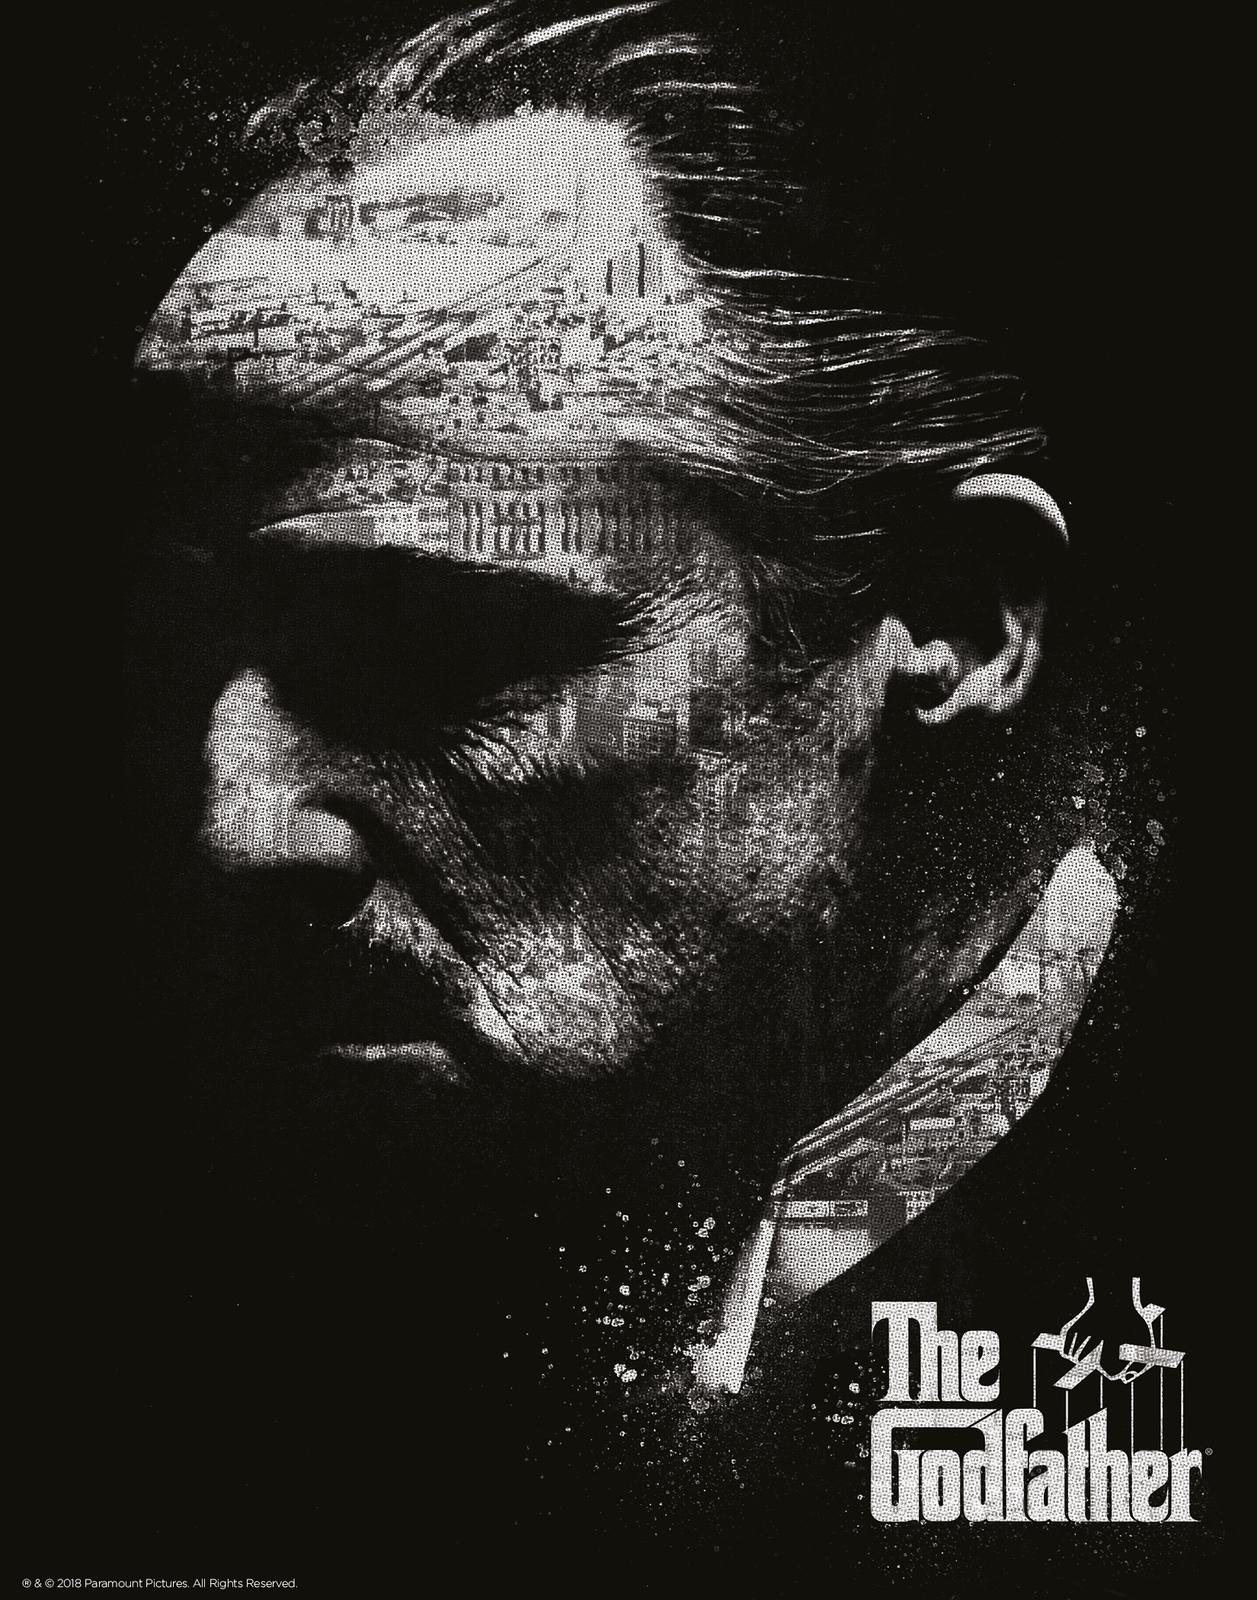 Godfather: Premium Art Print - Black & White image